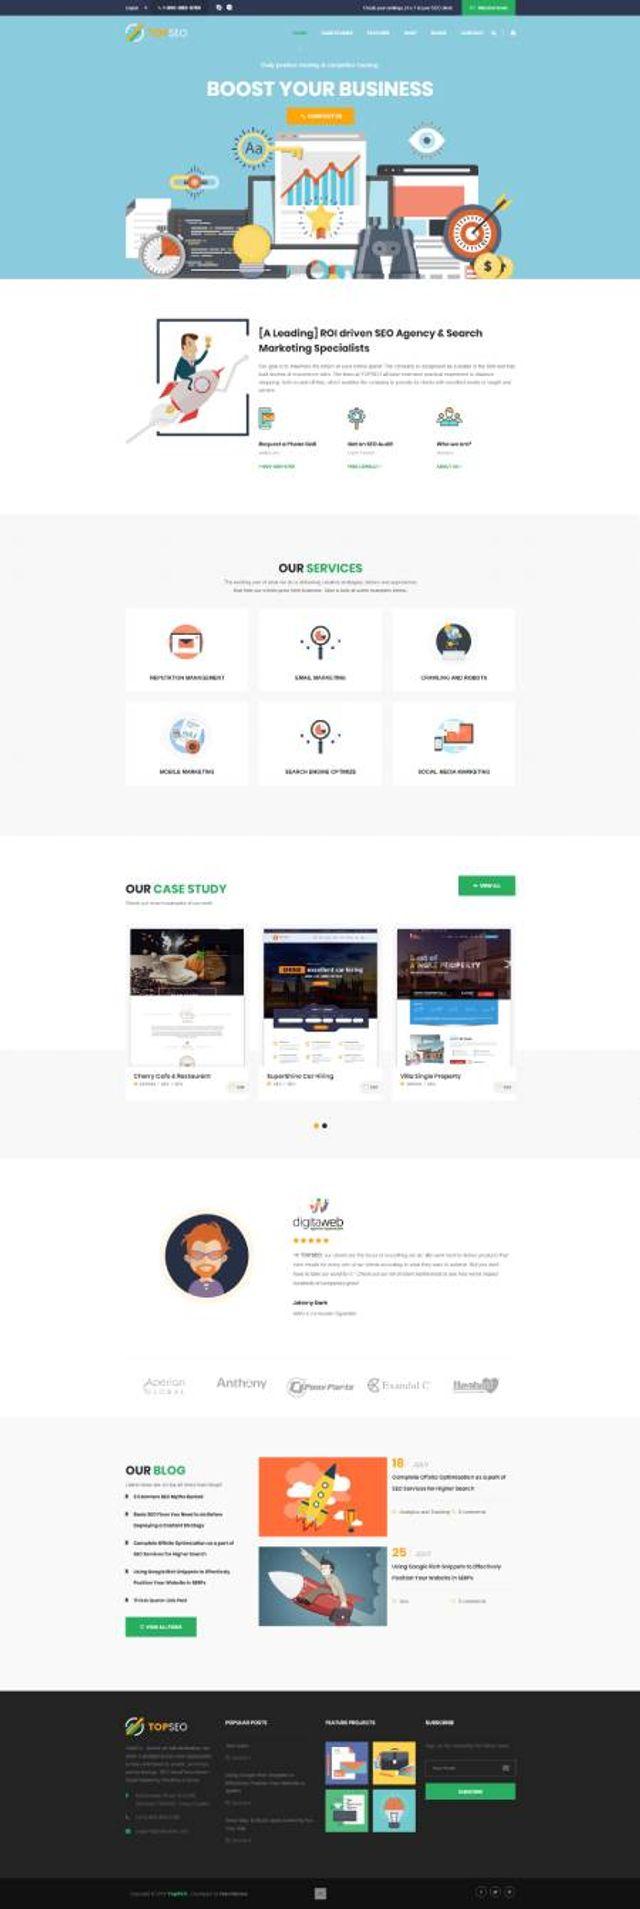 GD0706 – Mẫu Website Công Ty Marketing TopSEO